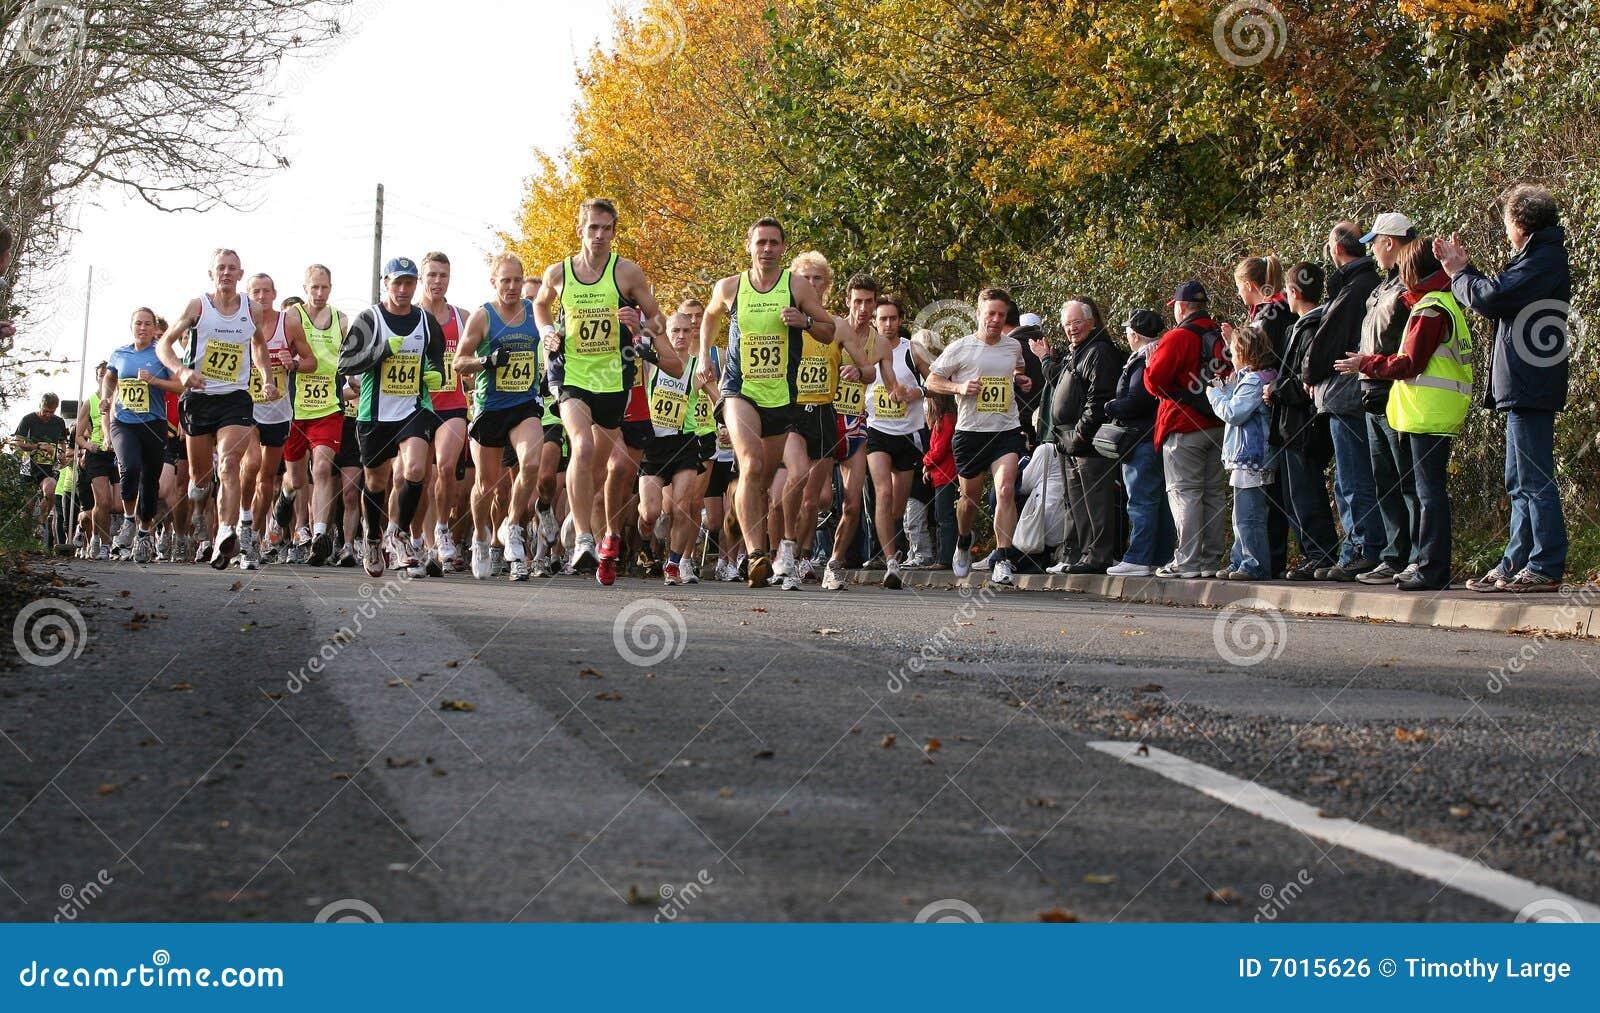 1 2 2008 cheddar марафон